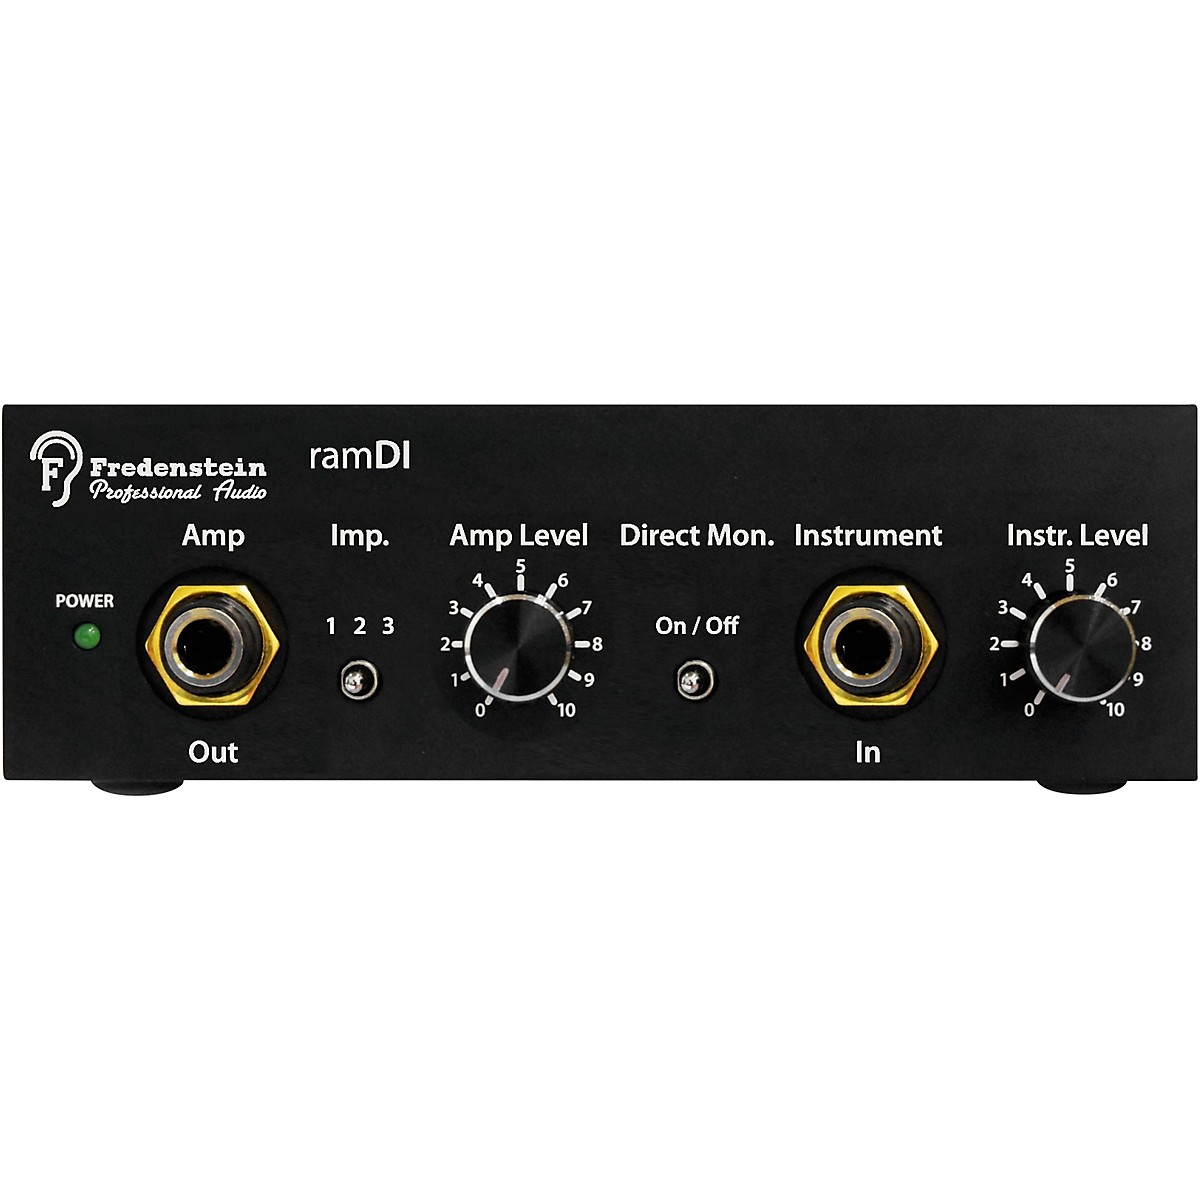 Fredenstein Professional Audio ramDI Re-Amplification and Direct Input